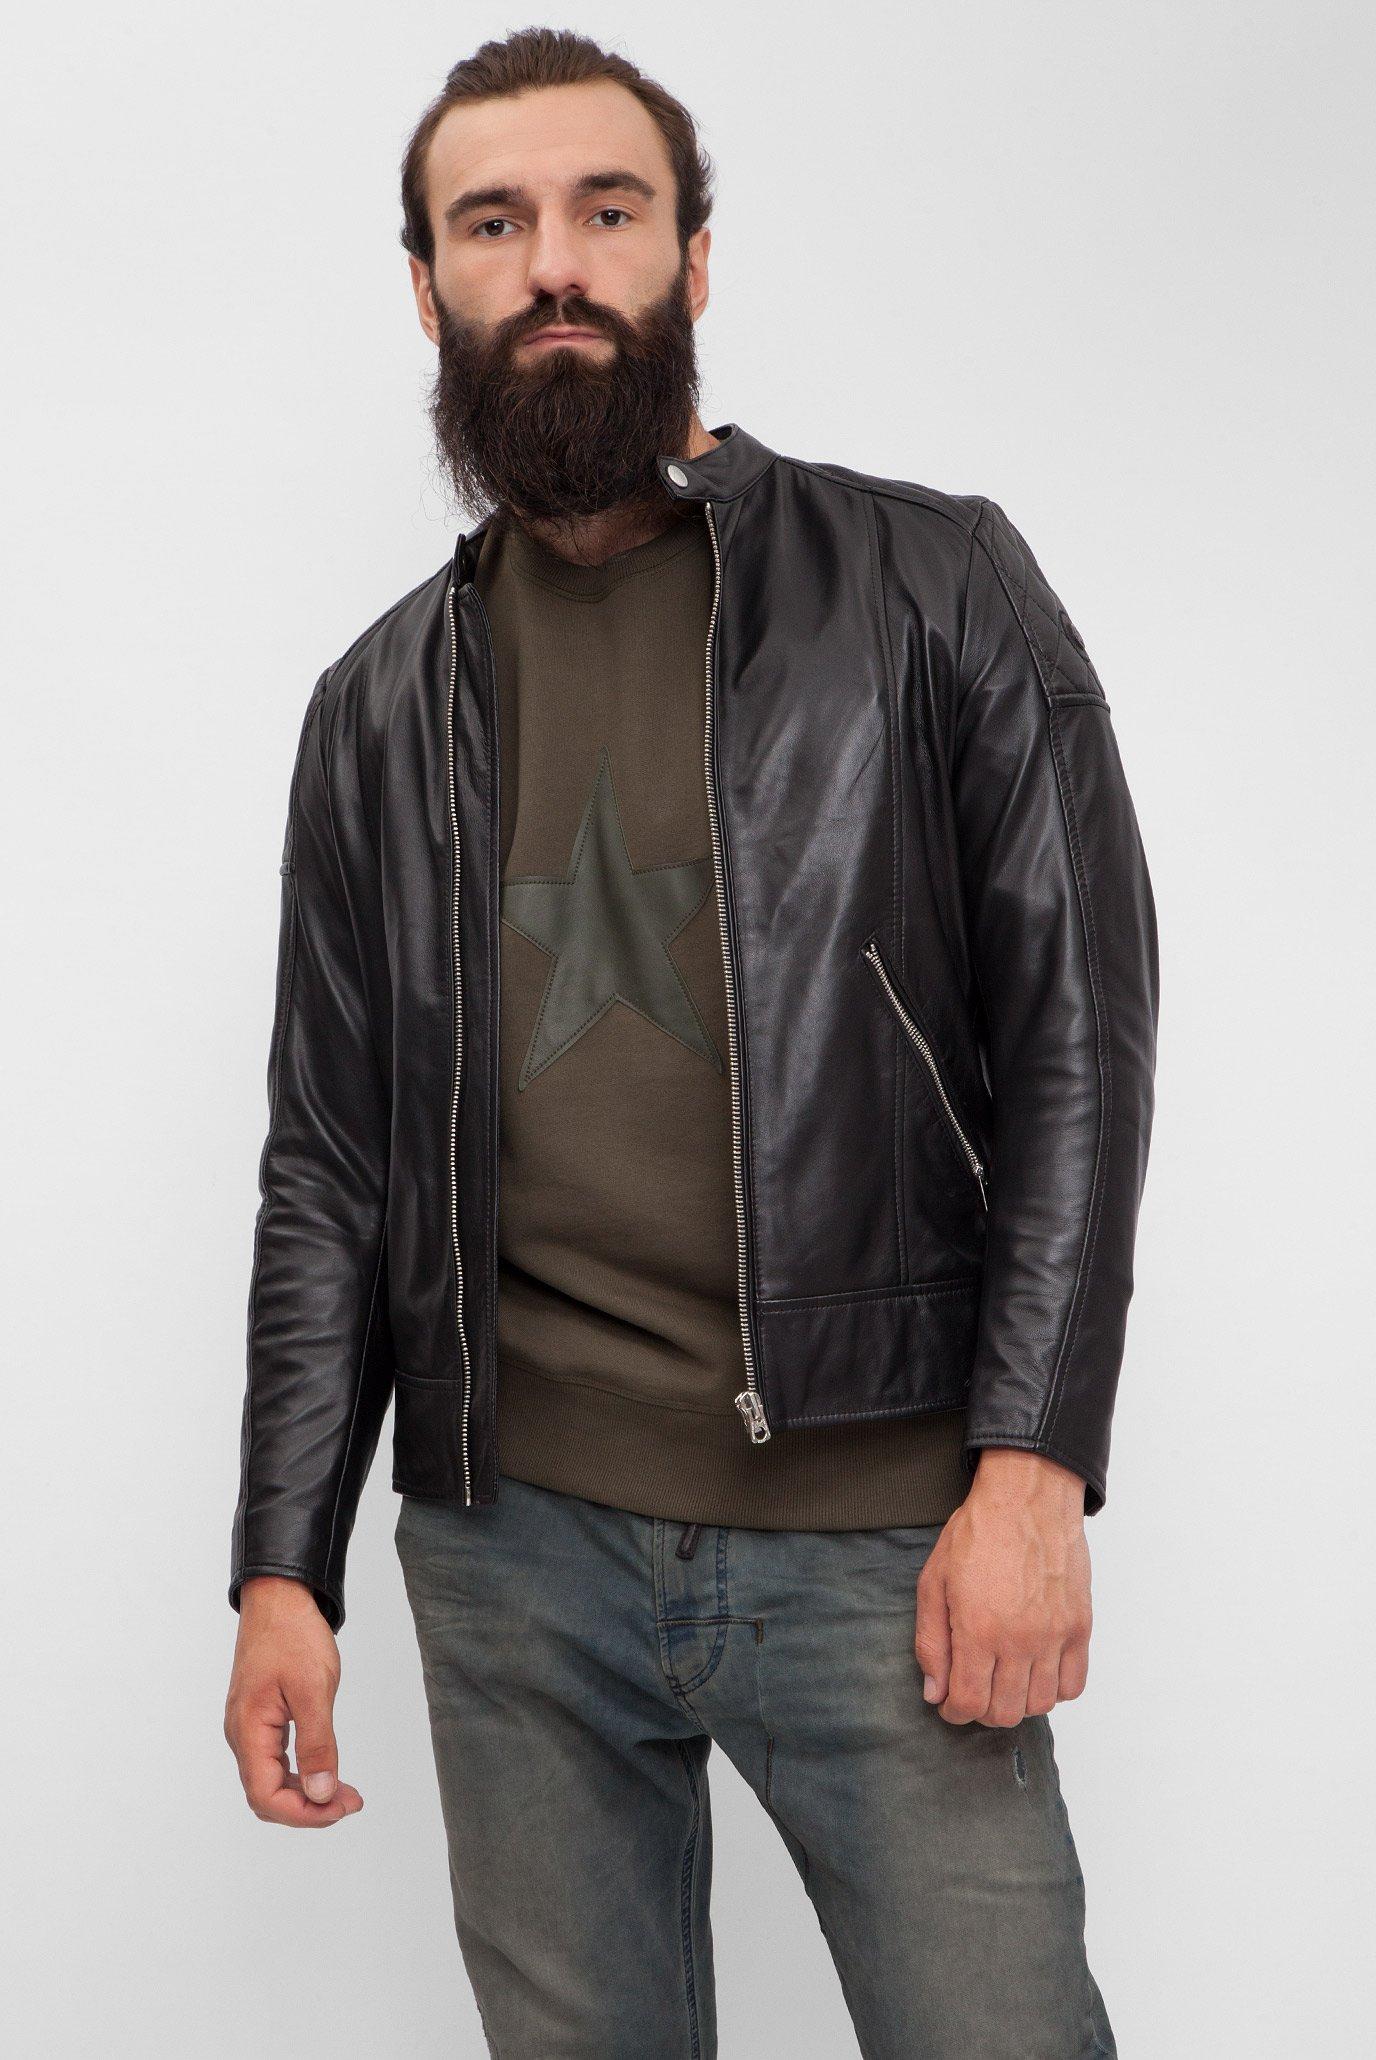 7aff7259d04 Купить Мужская черная кожаная куртка Diesel Diesel 00SRDZ 0WAGL – Киев